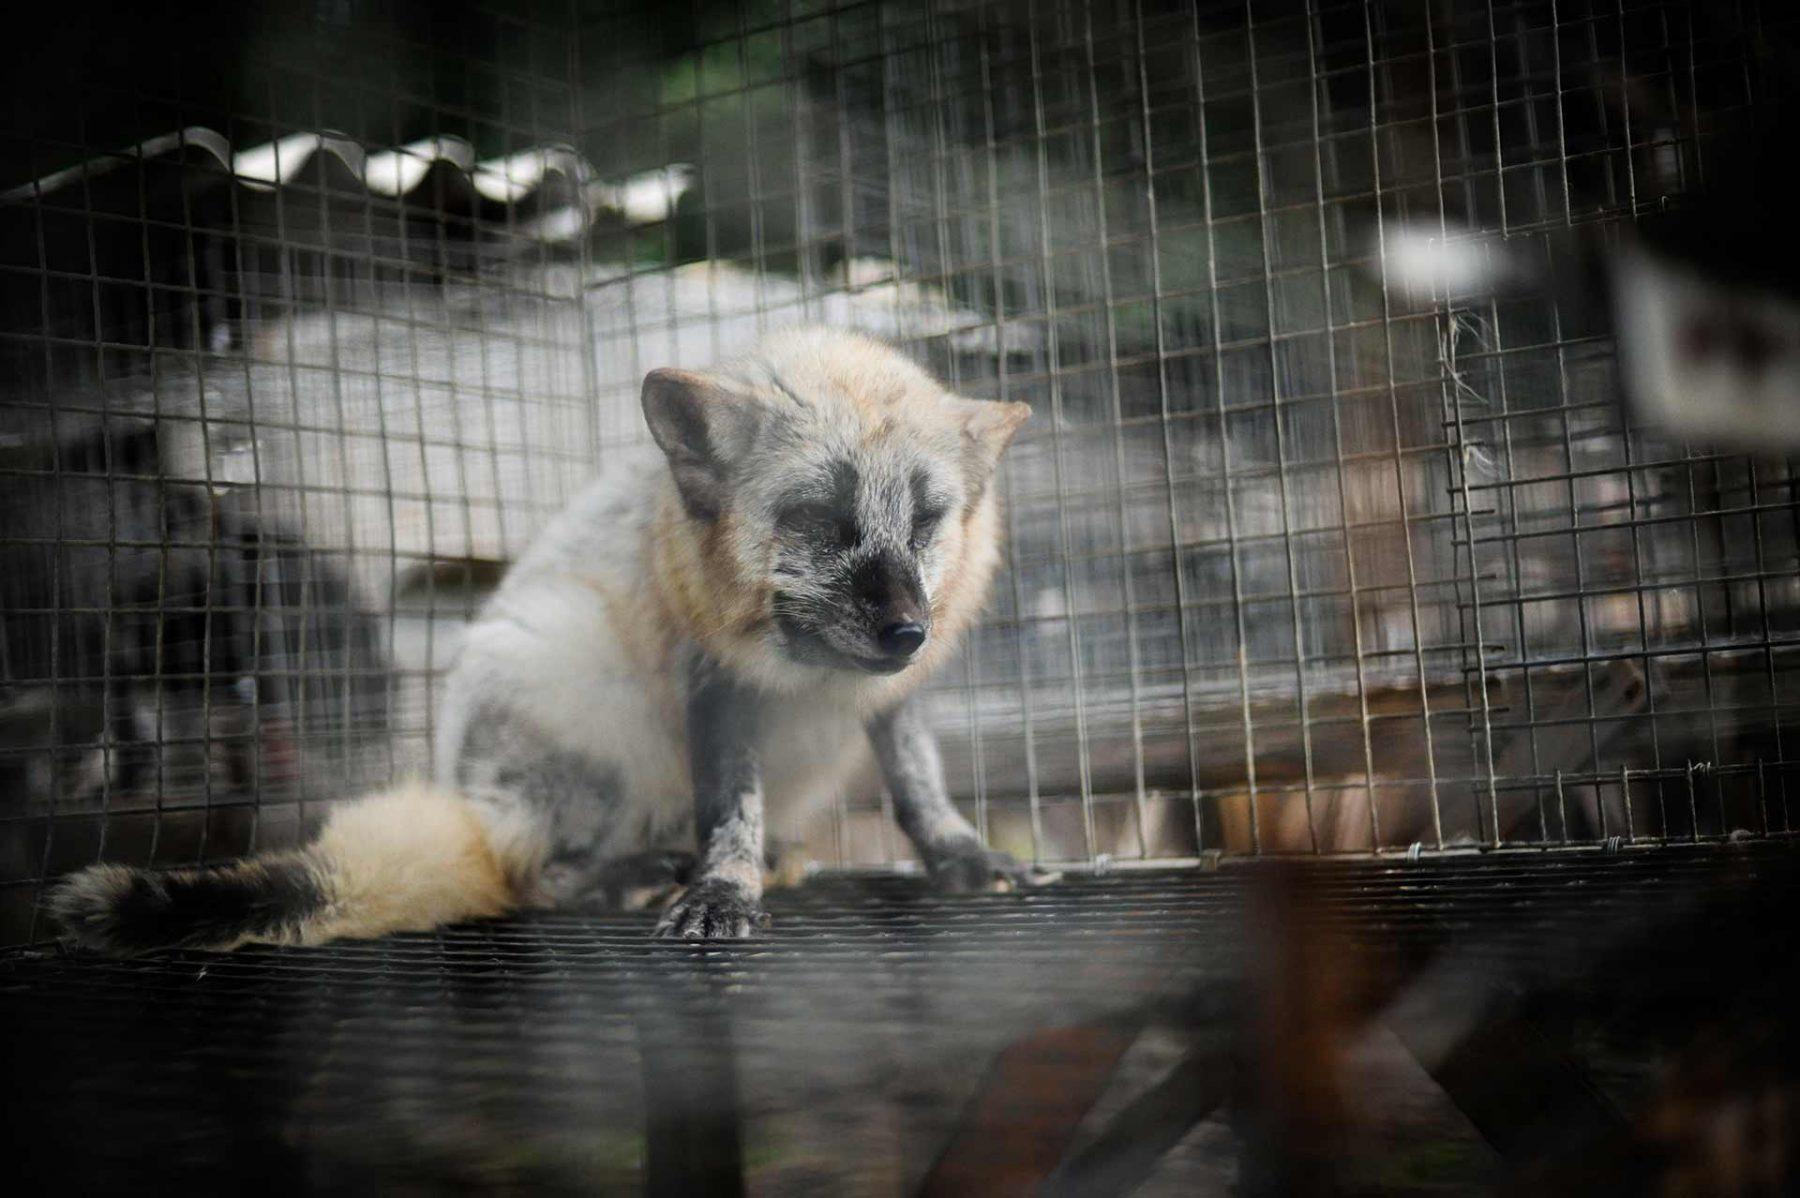 A calico fox in a fur farm. Poland, 2012. JMcArthur / The Ghosts in Our Machine